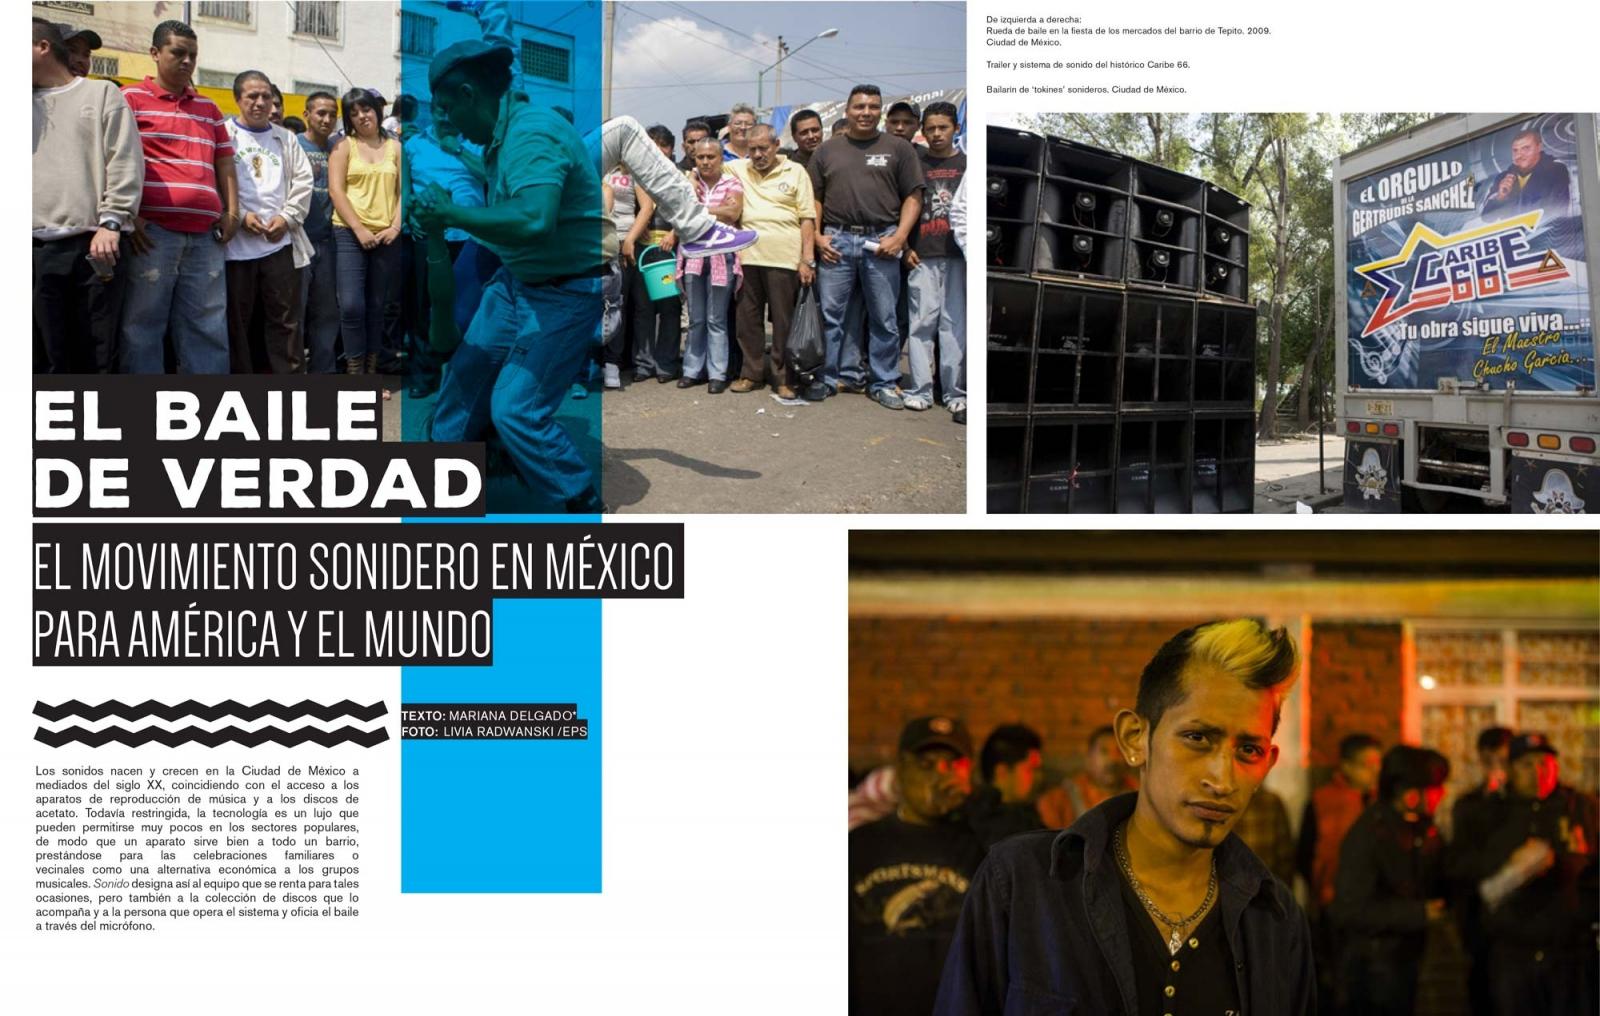 Art and Documentary Photography - Loading Bailen_espana_sonidero_1_depdf.jpg